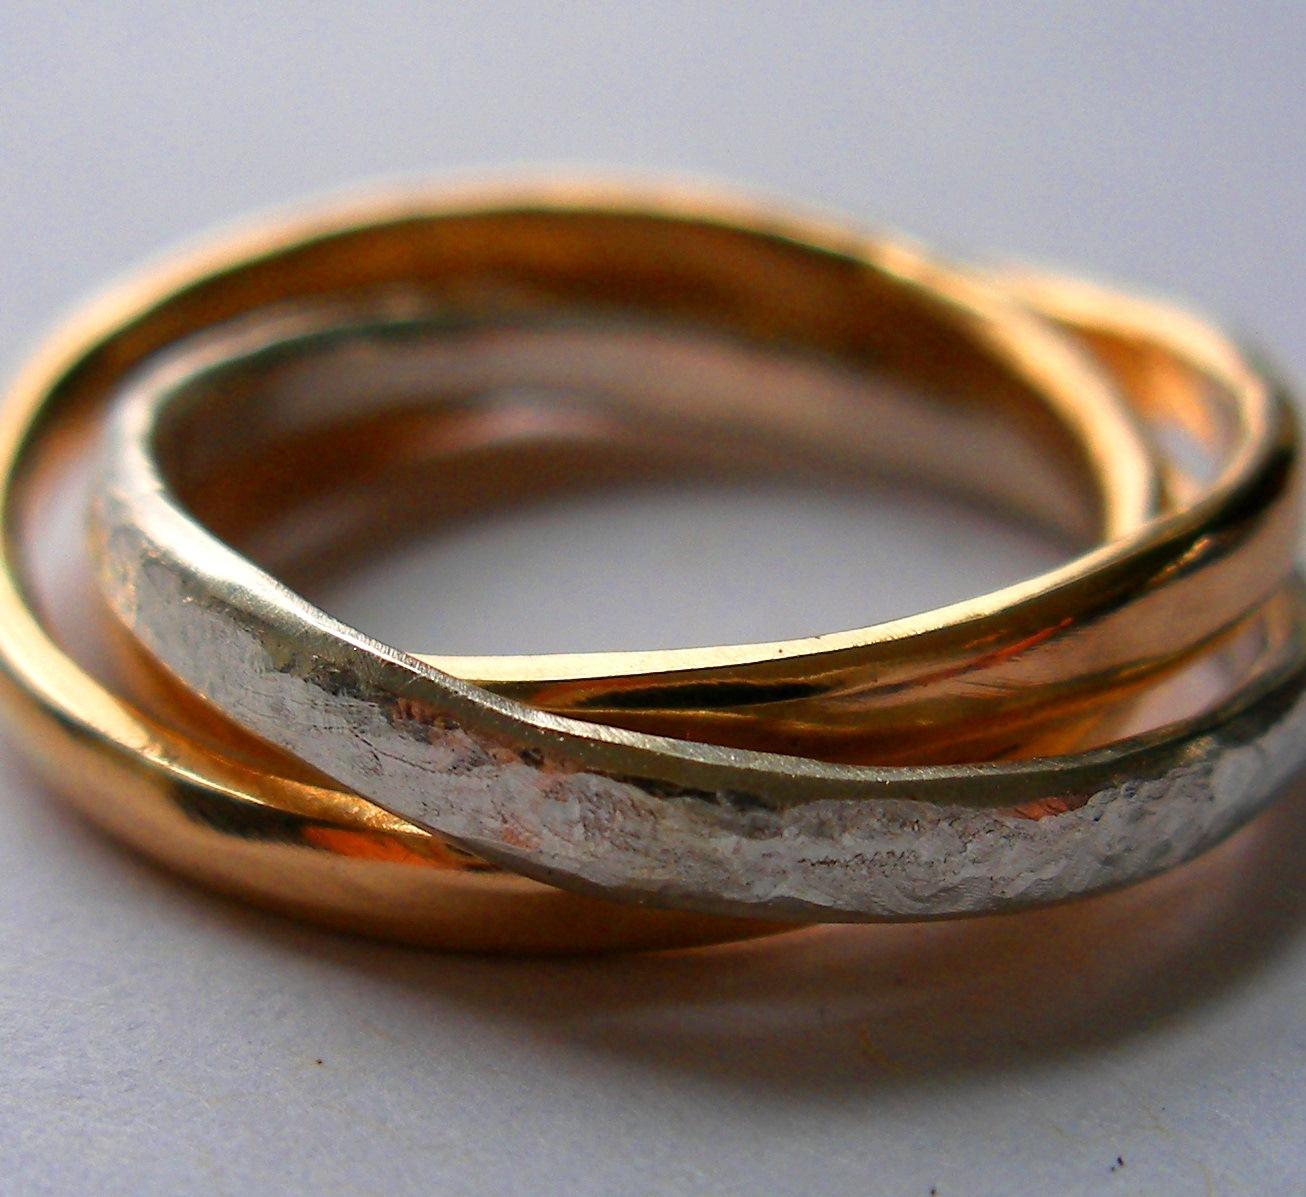 Interlocking Russian Wedding Rings